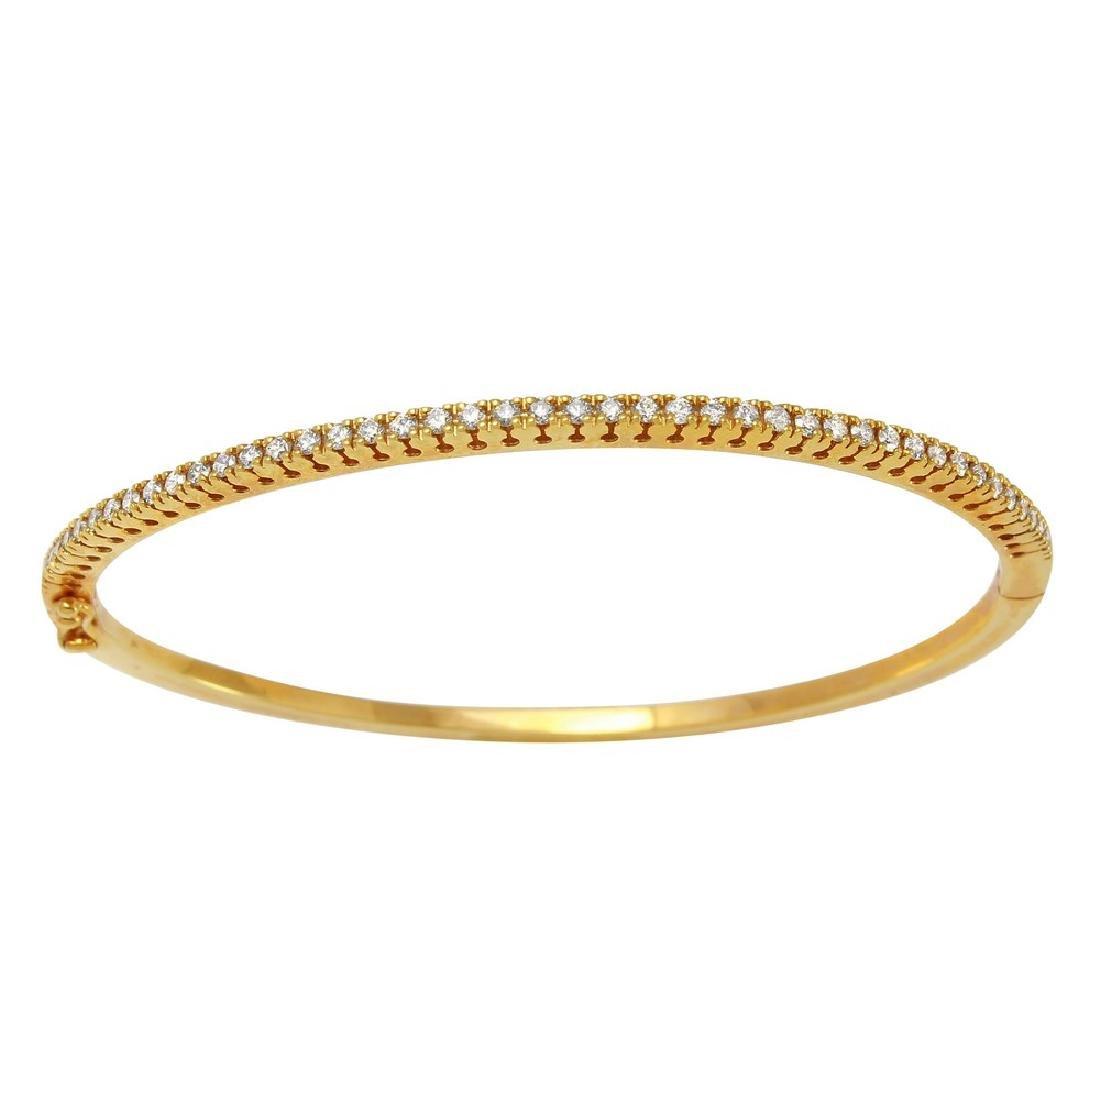 0.84CTW Diamond Bangle Bracelet in 14K Yellow Gold